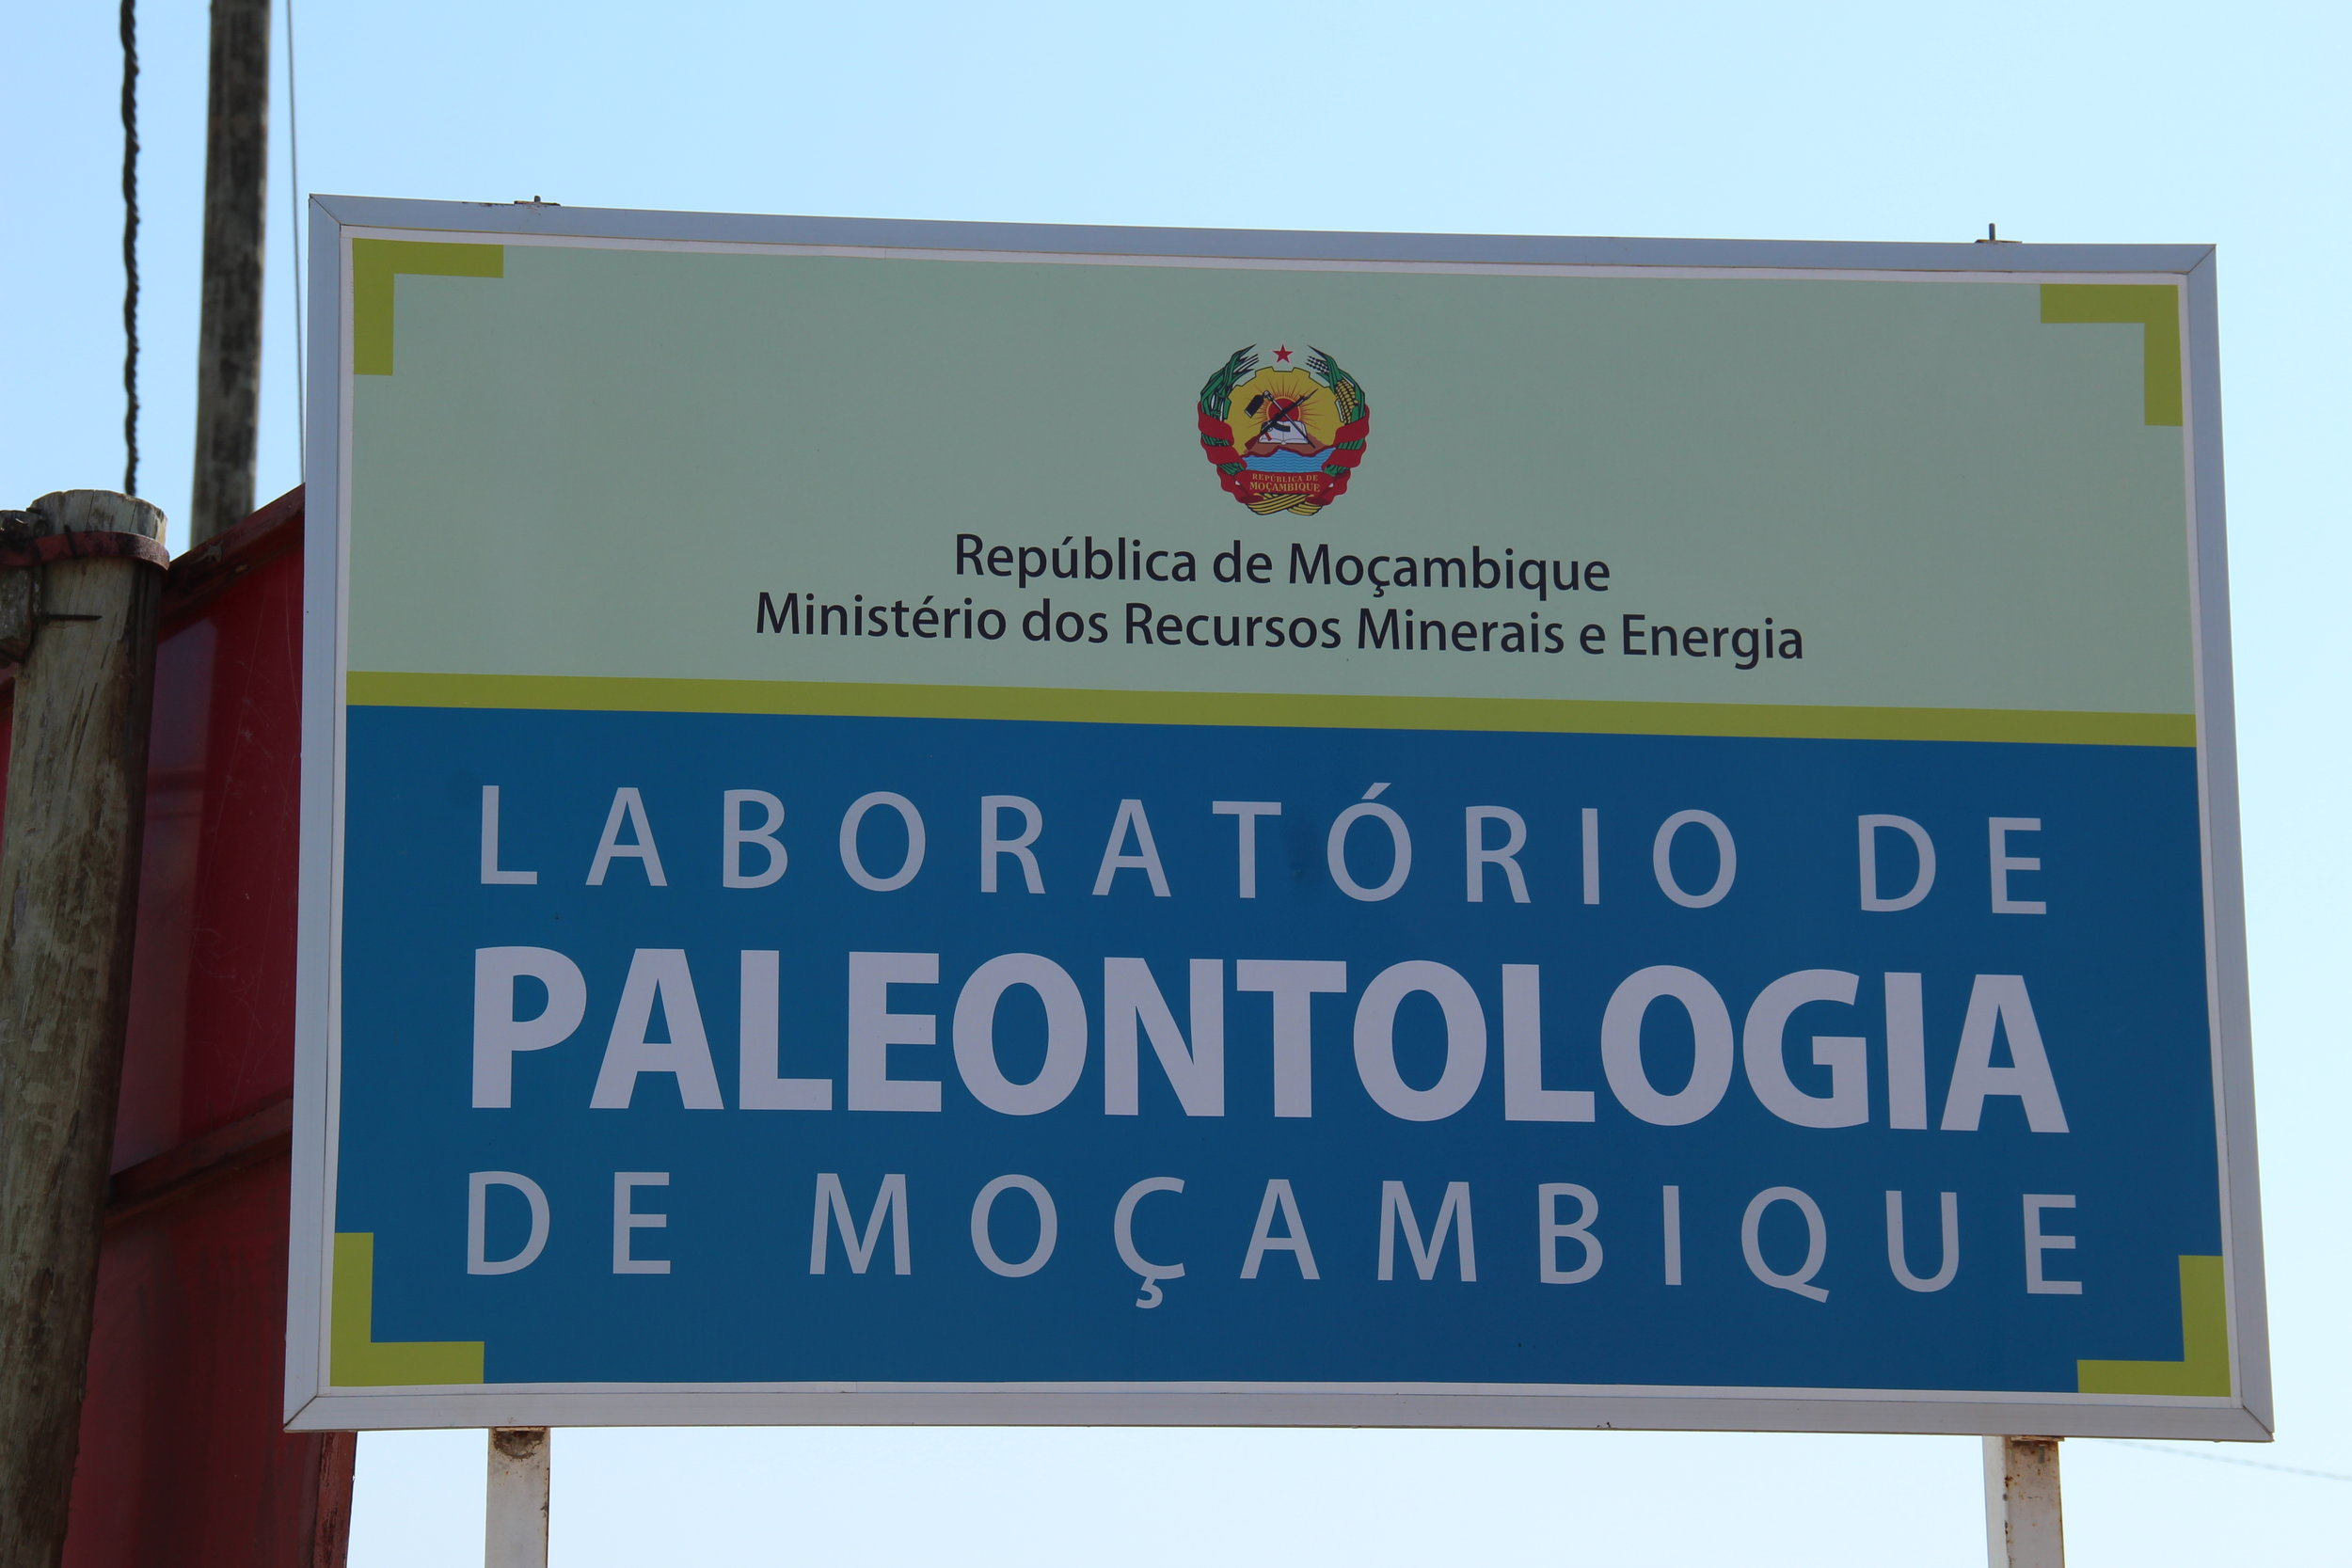 The Paleontology Laboratory was inaugurated.